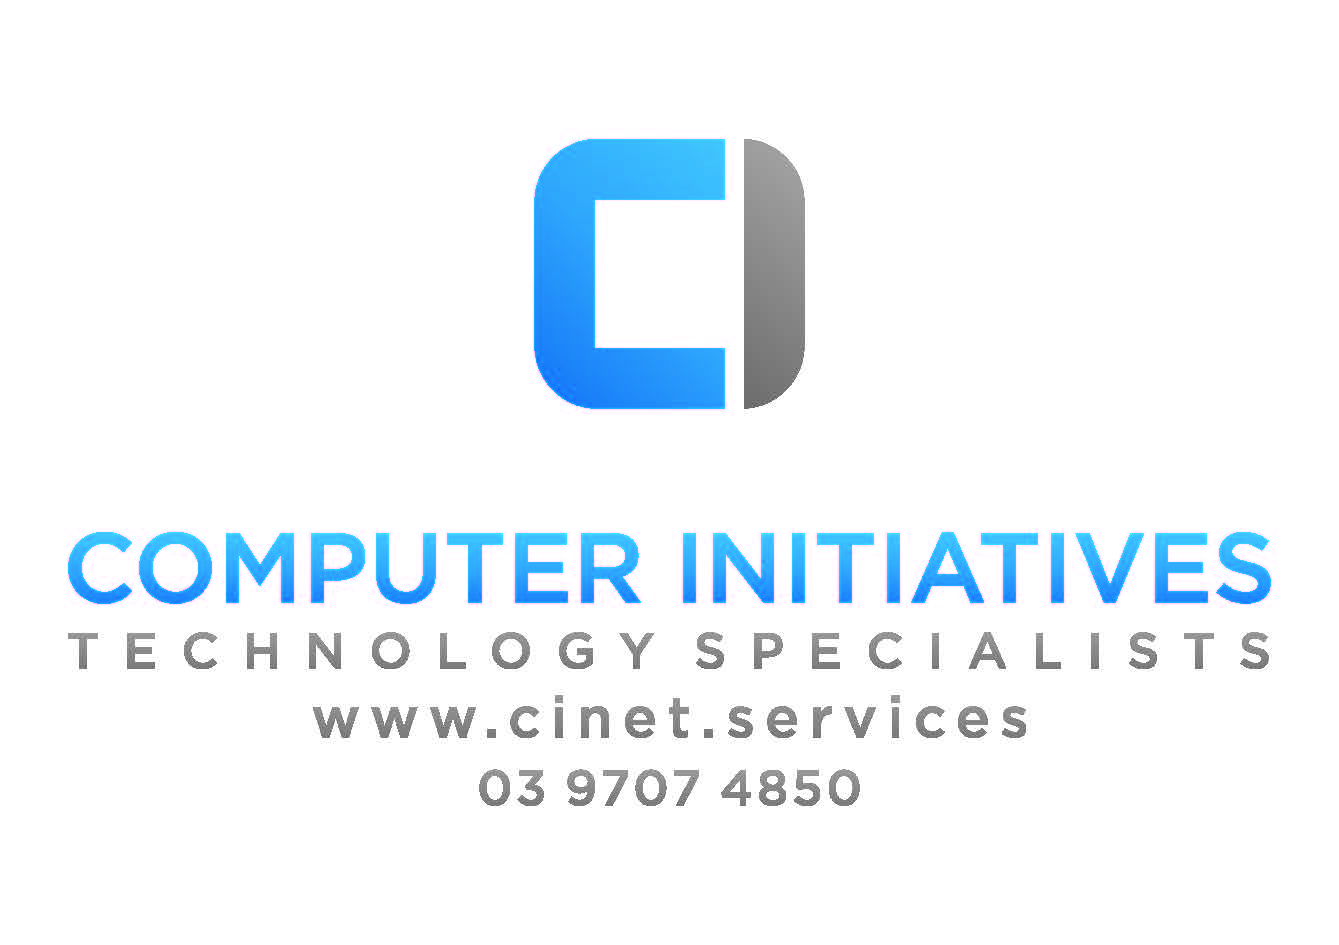 Computer Initiatives